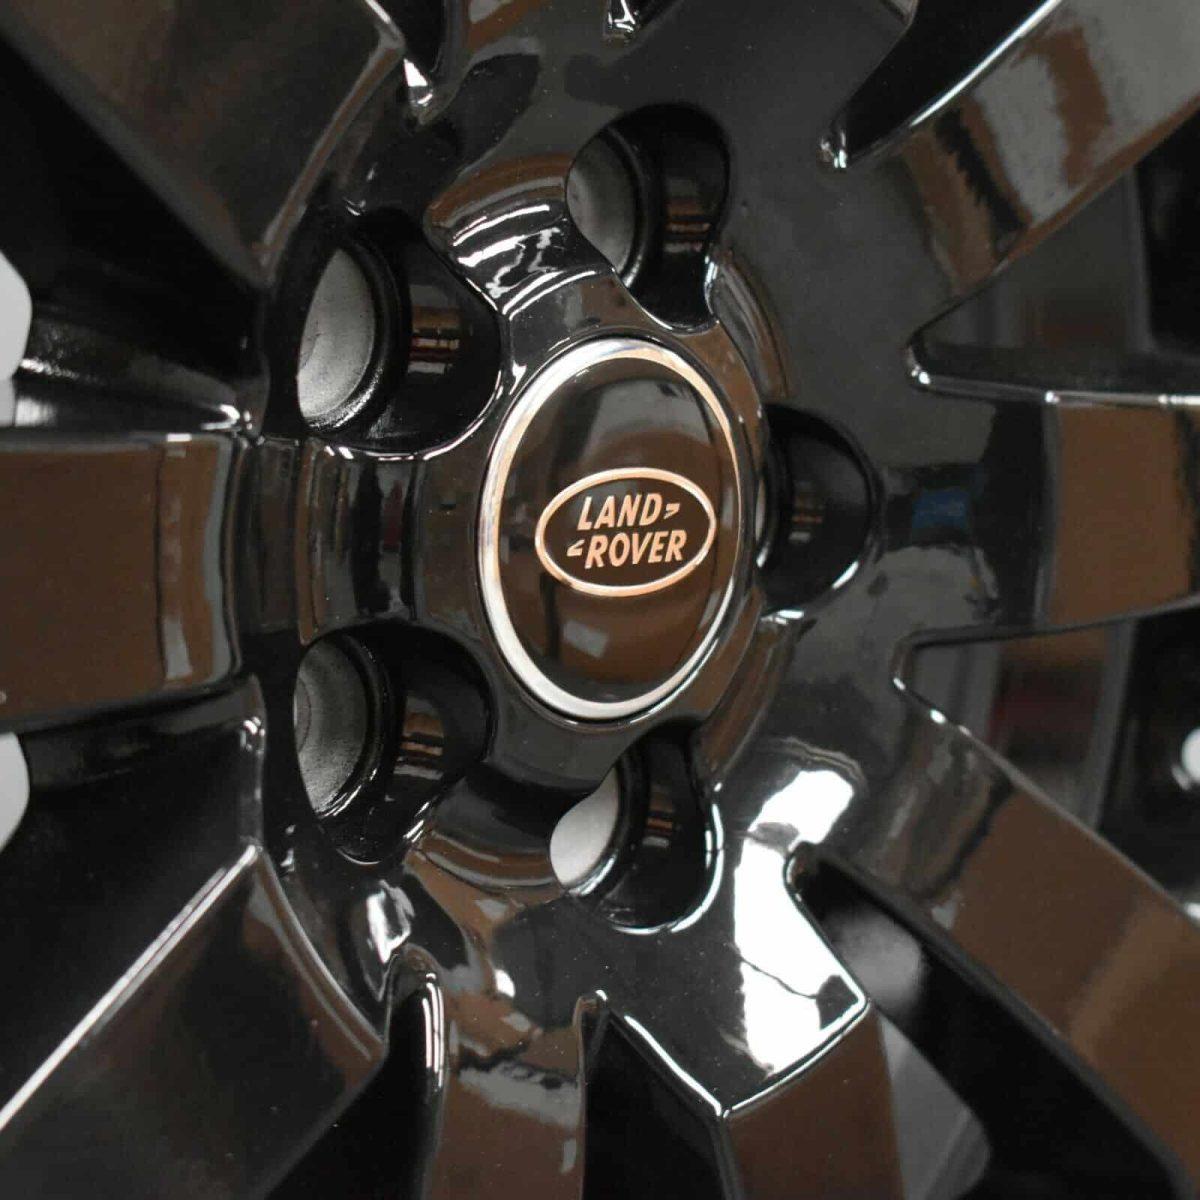 "Genuine Land Rover Freelander 2 HSE 10 Spoke 19"" Inch Alloy Wheels with Gloss Black Finish LR002802"